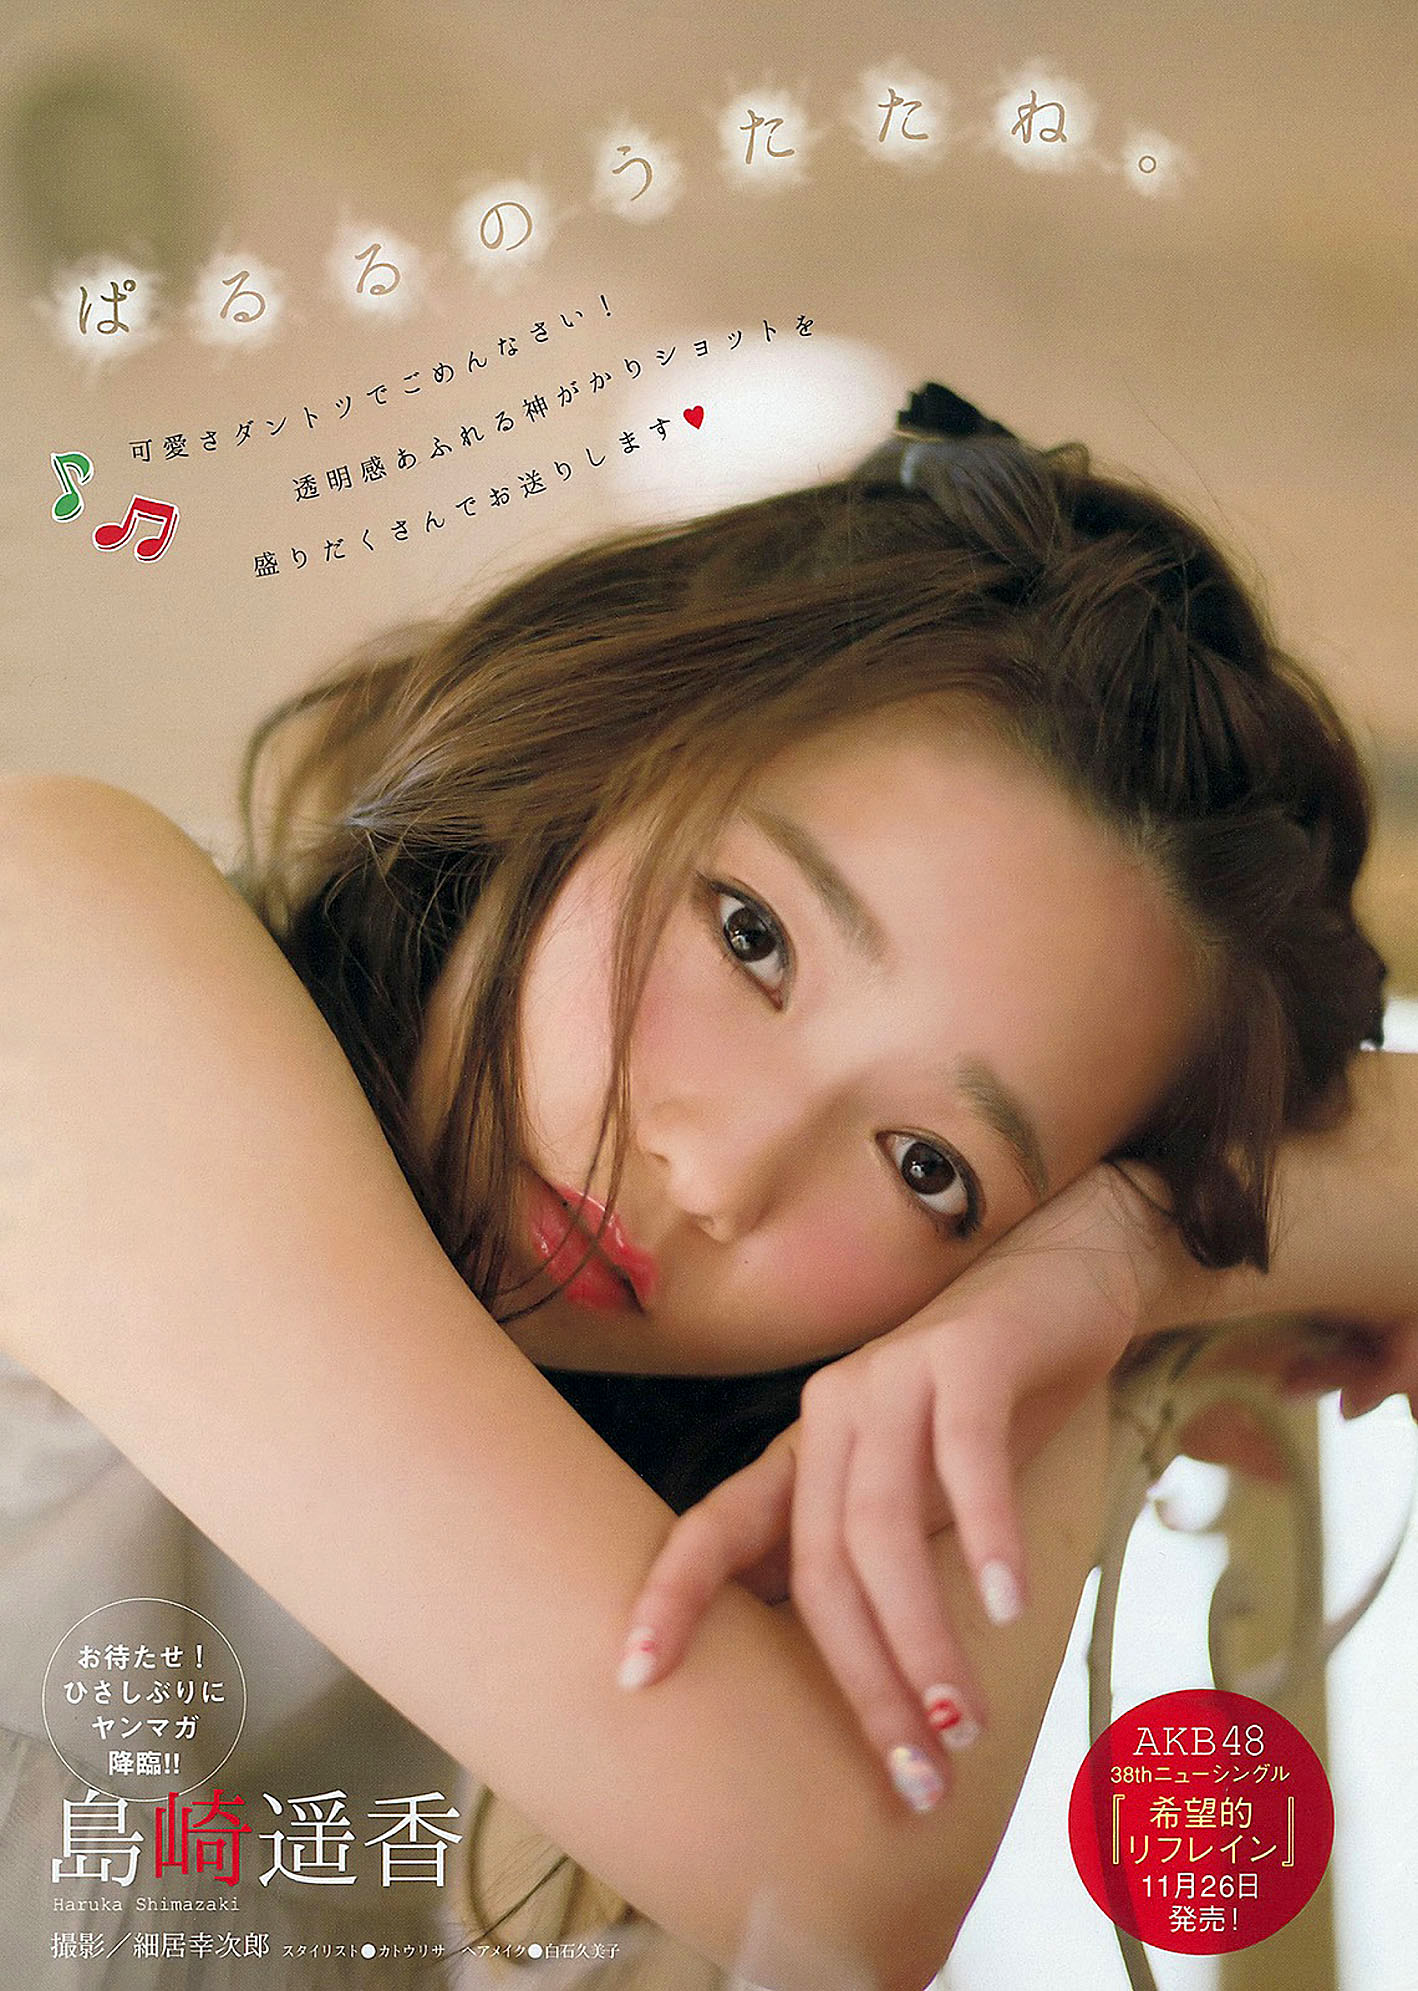 HShimazaki Young Magazine 141201 02.jpg